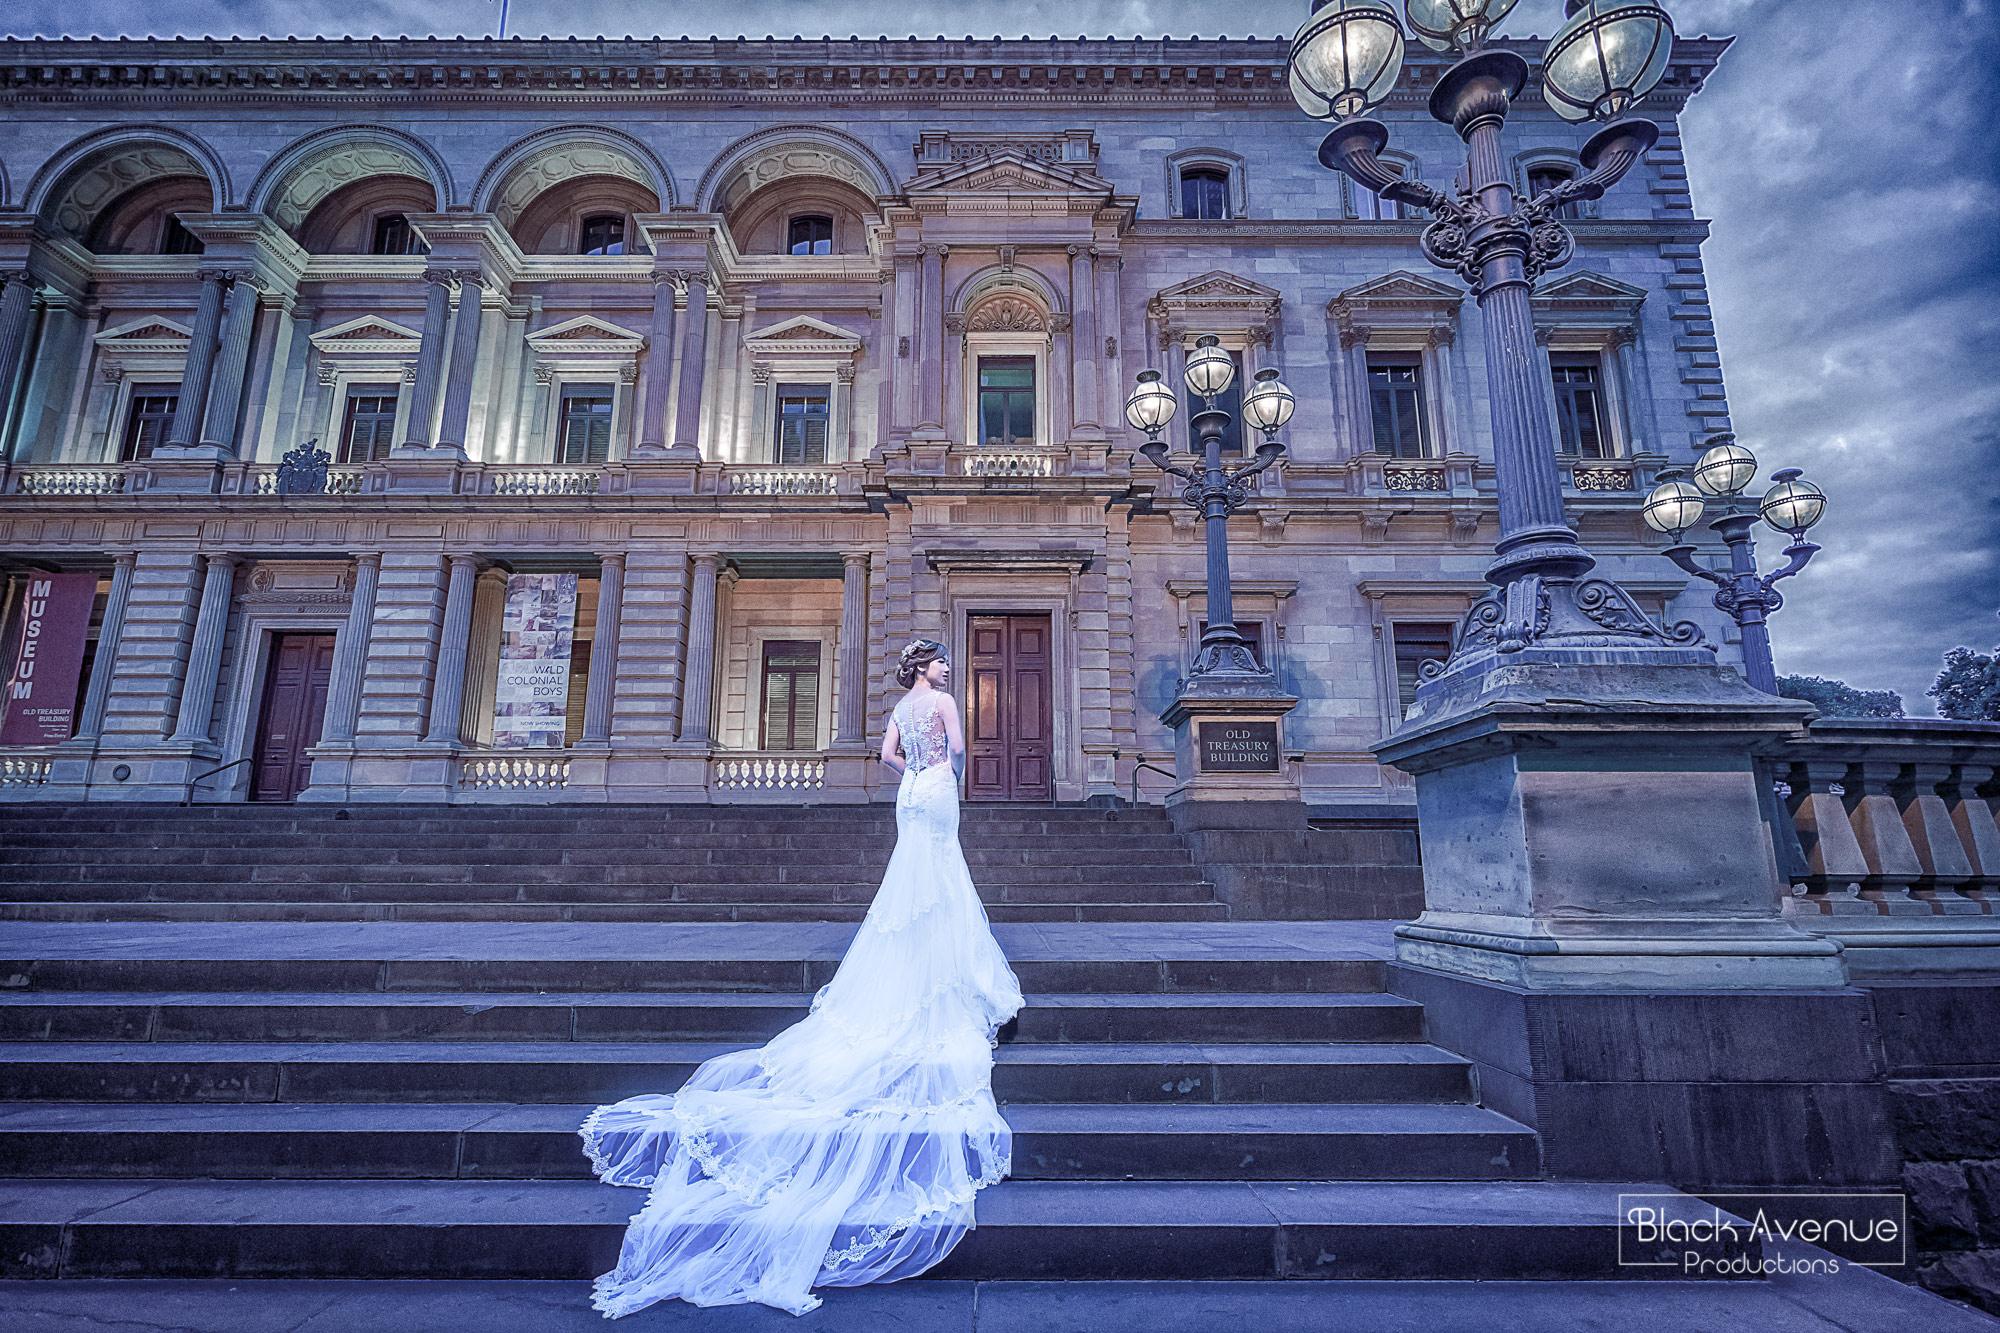 artistic canvas style bride portrait by the Old Treasury Building in Melbourne Australia